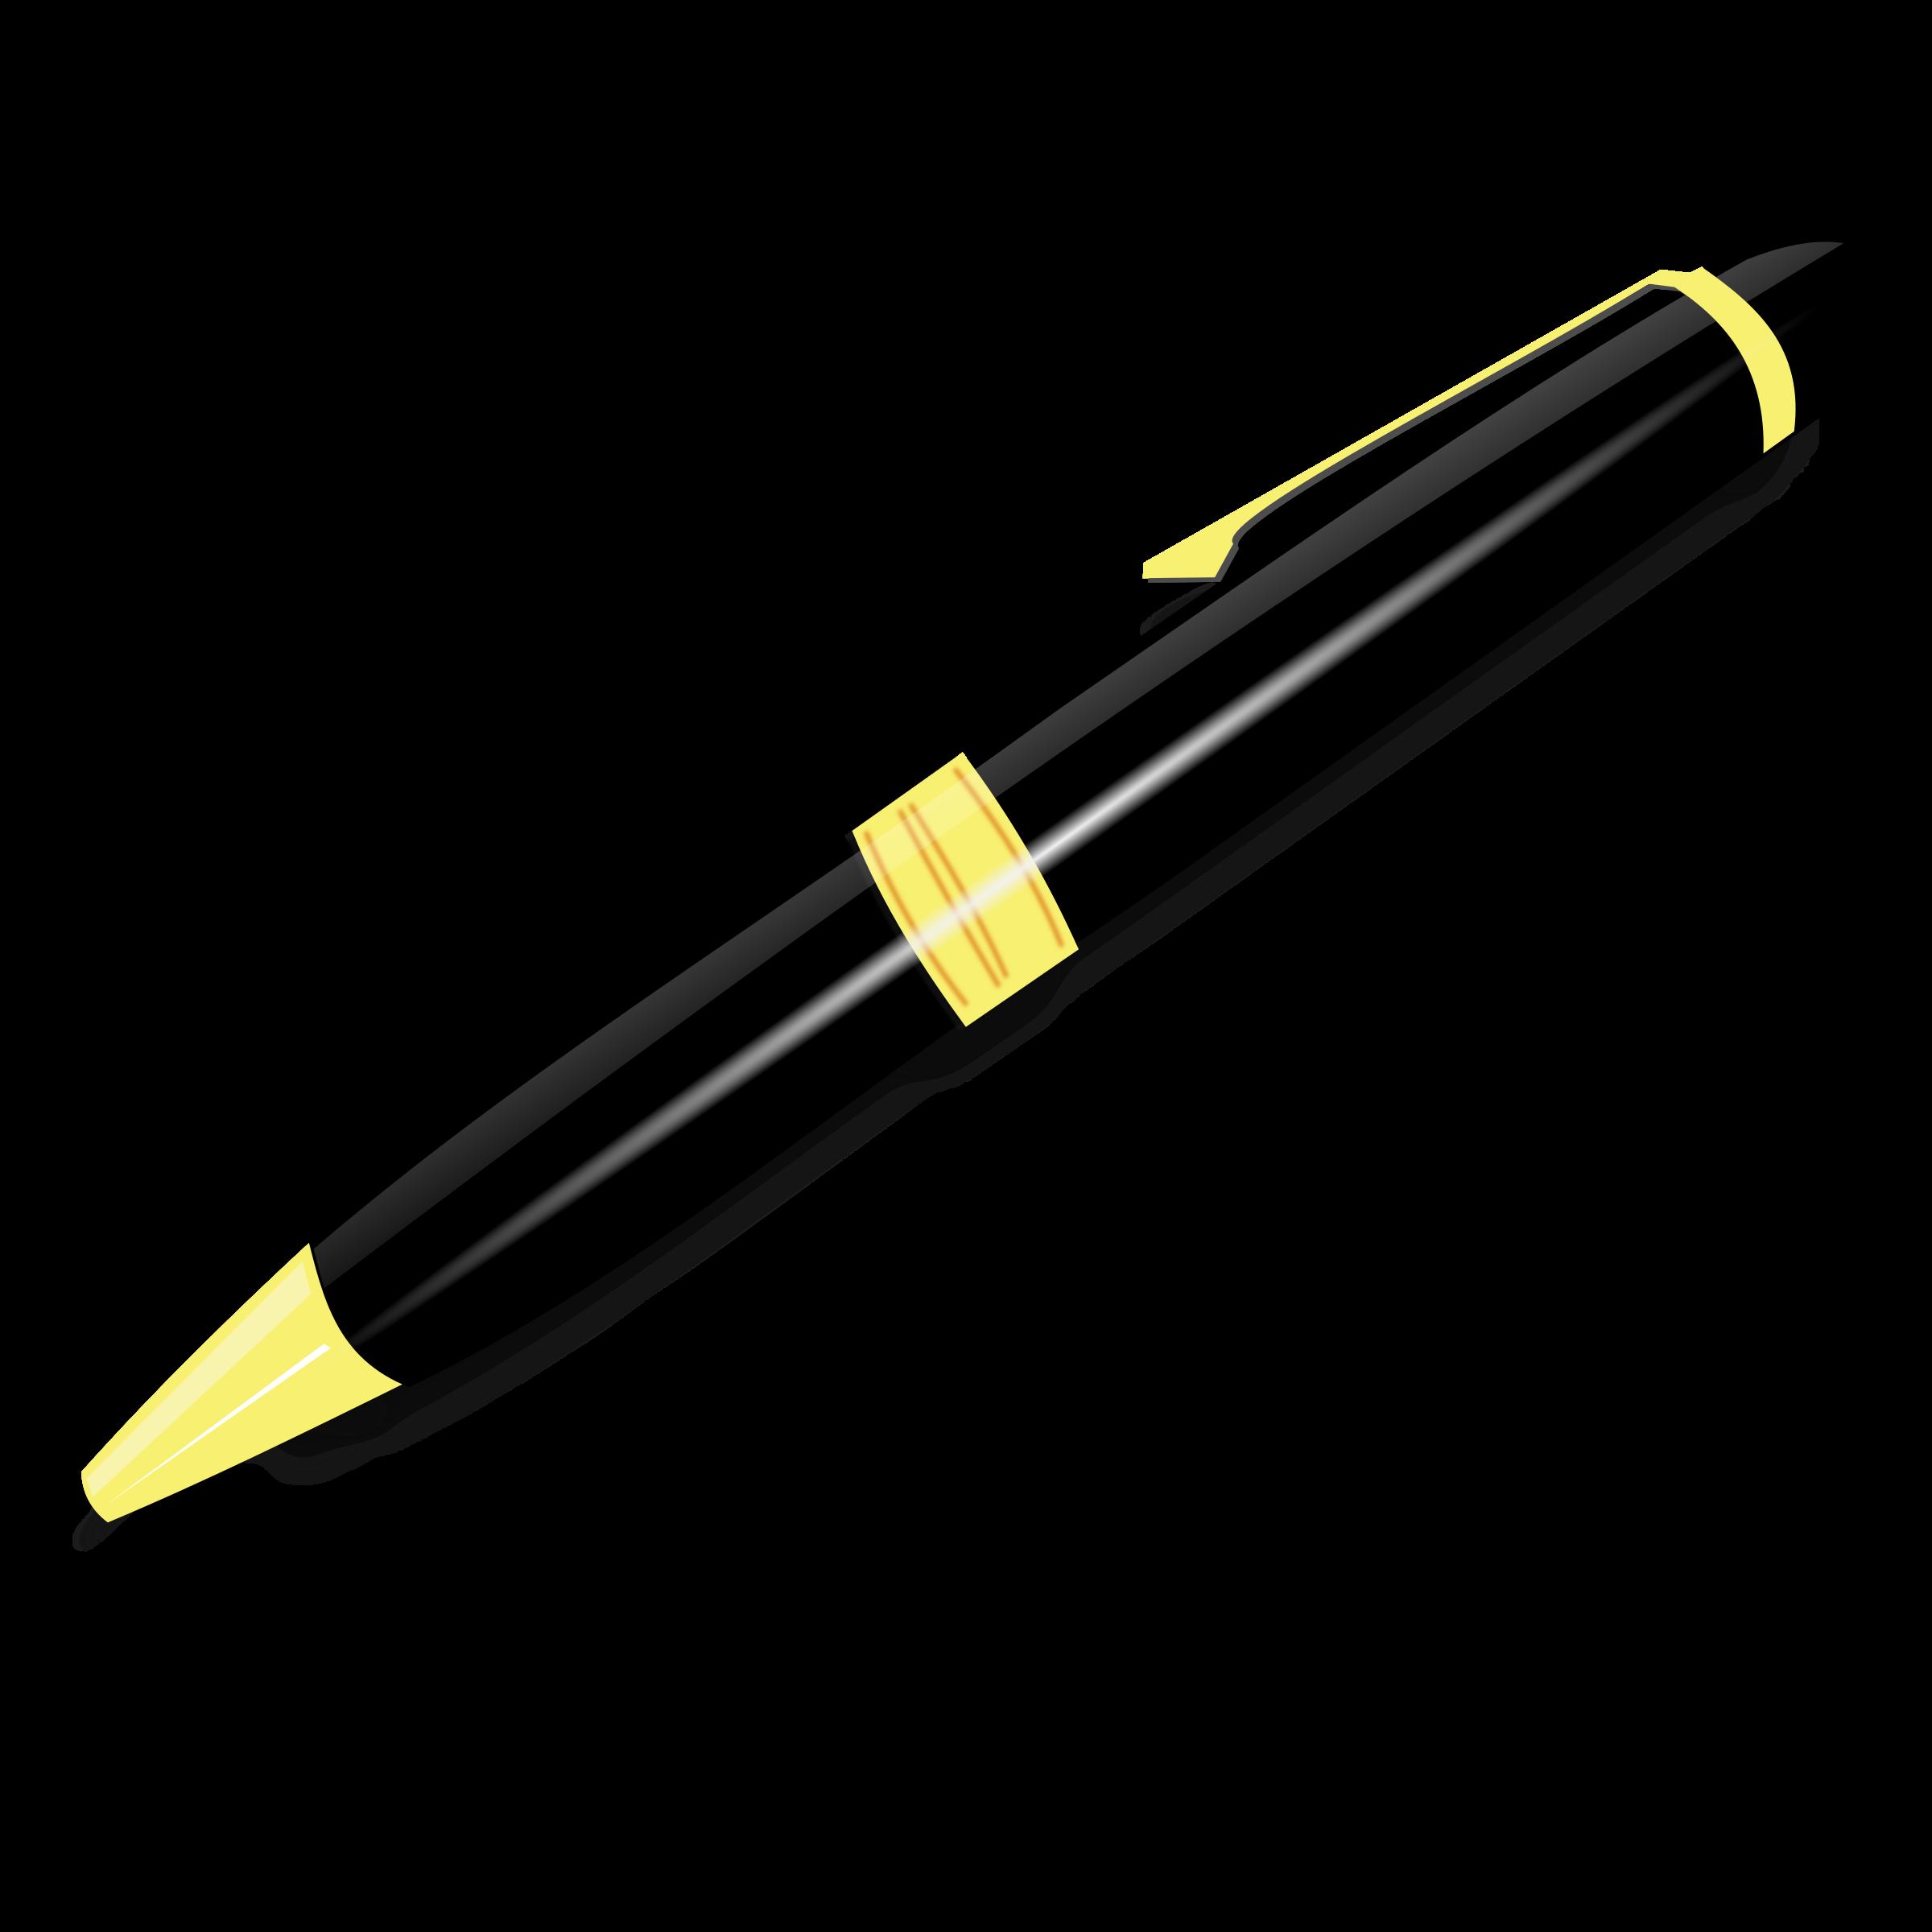 Black Pen PNG Transparent